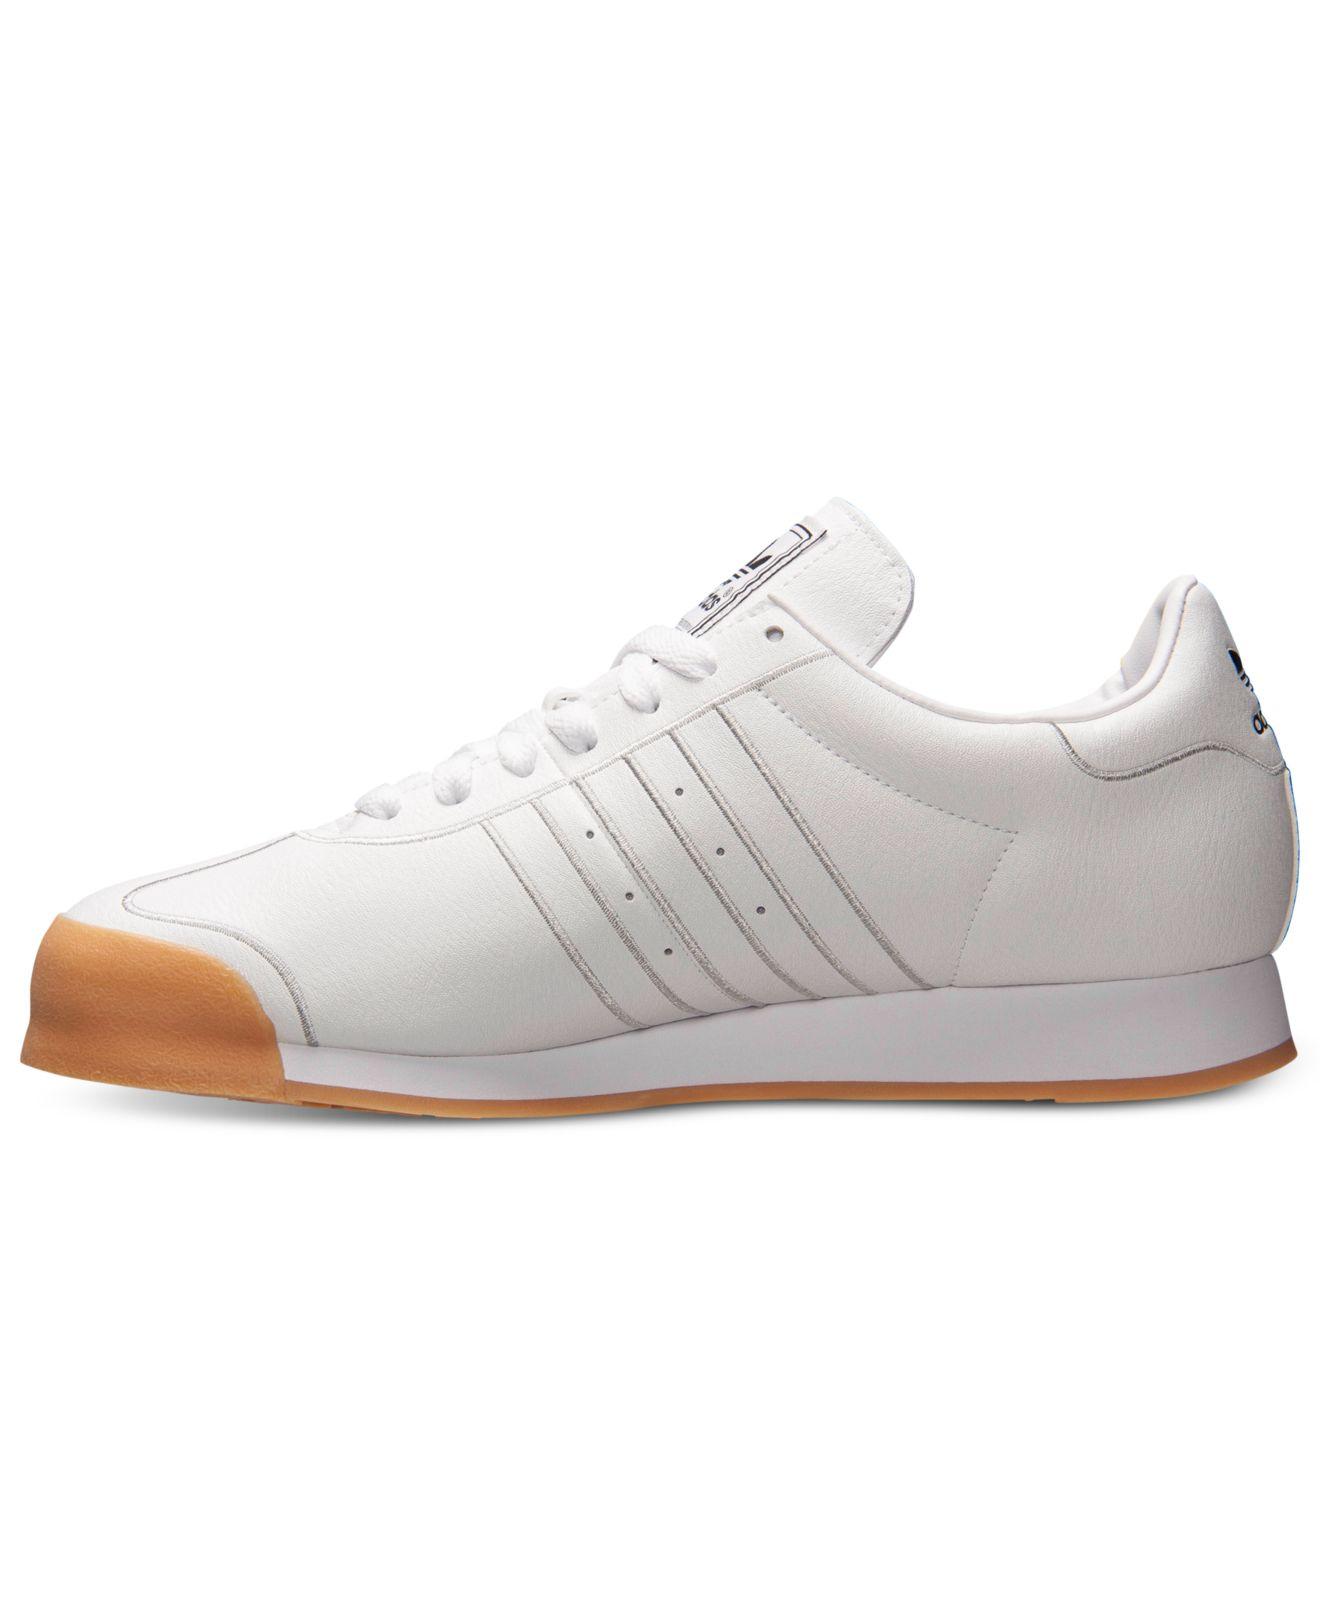 samoa mens scarpe adidas originali